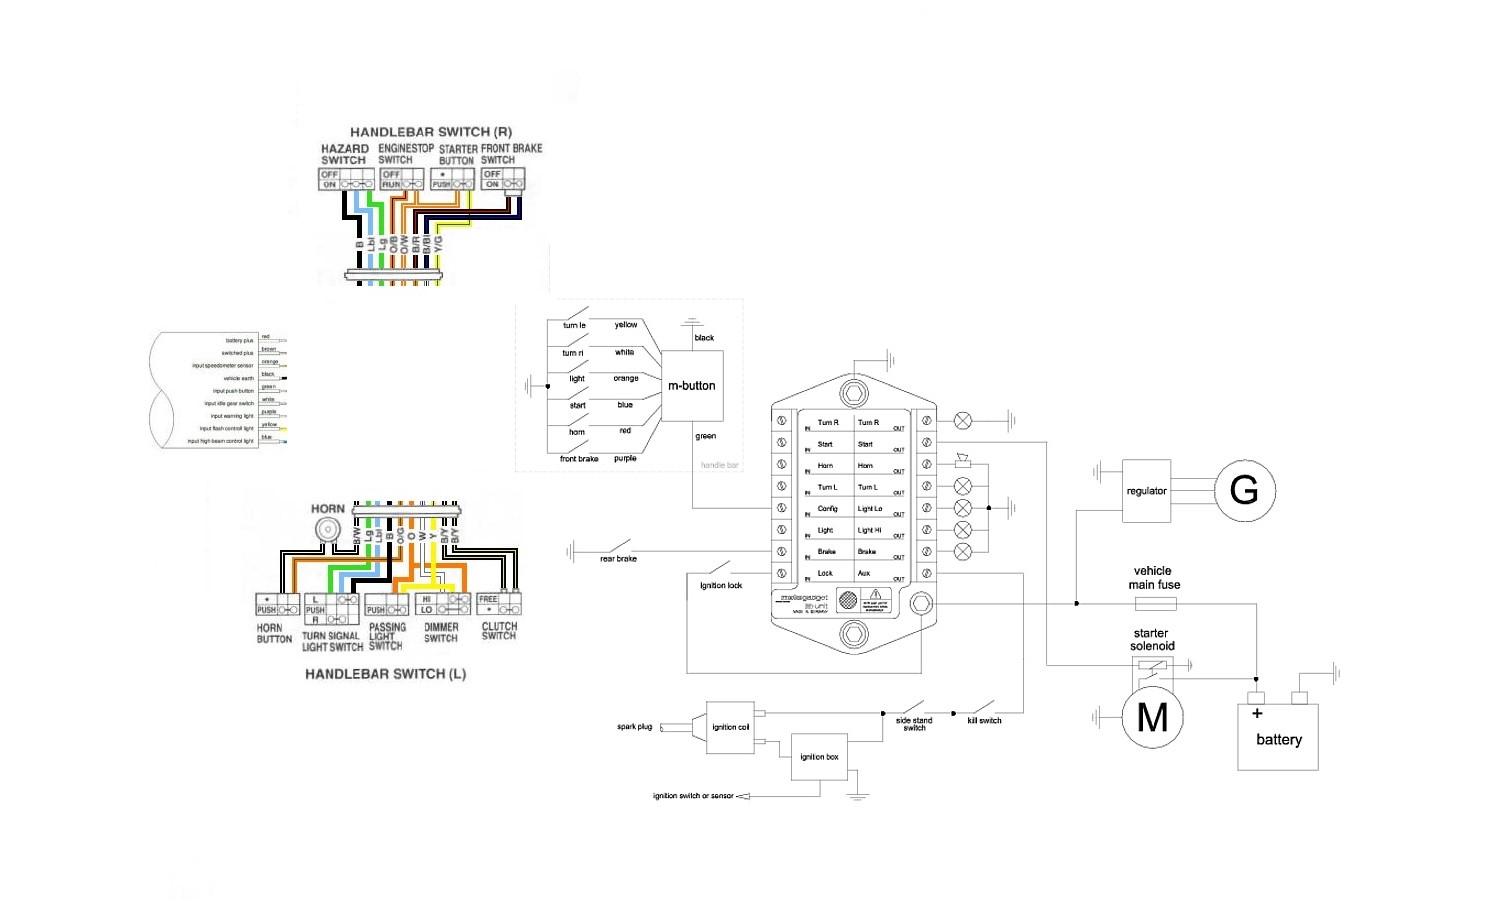 Honda Cx Usa Thermostatwater Pipe Bighu E A as well D Cx M Unit M Button Wiring Diagram Cdi Cx A Cx Wiring also B Bce E further Wiring Gl Interstab furthermore D Cx E Sports Service Manual Wiring Diagram Cx C De Nec. on cx 500 honda wiring diagram